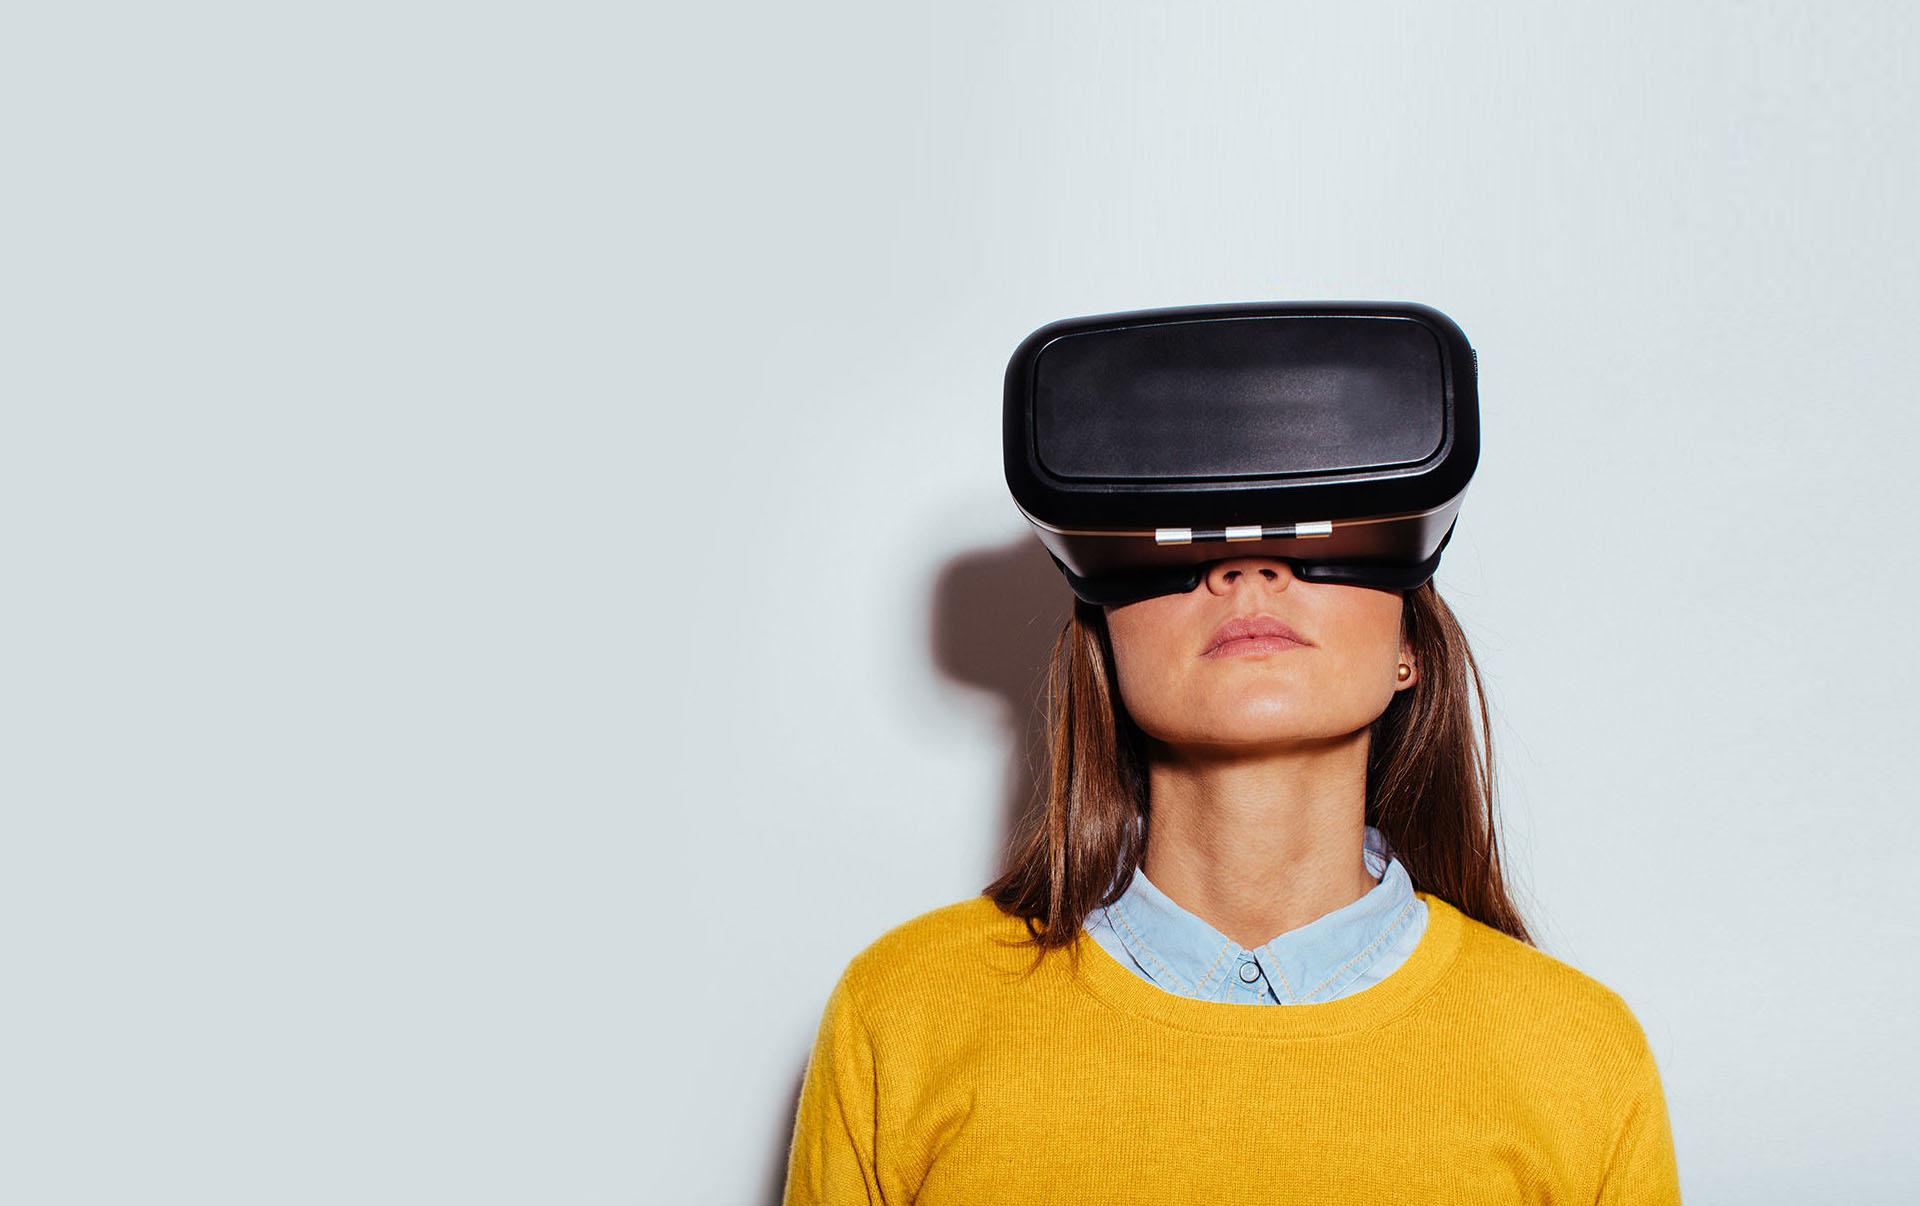 virtual tour software 2020